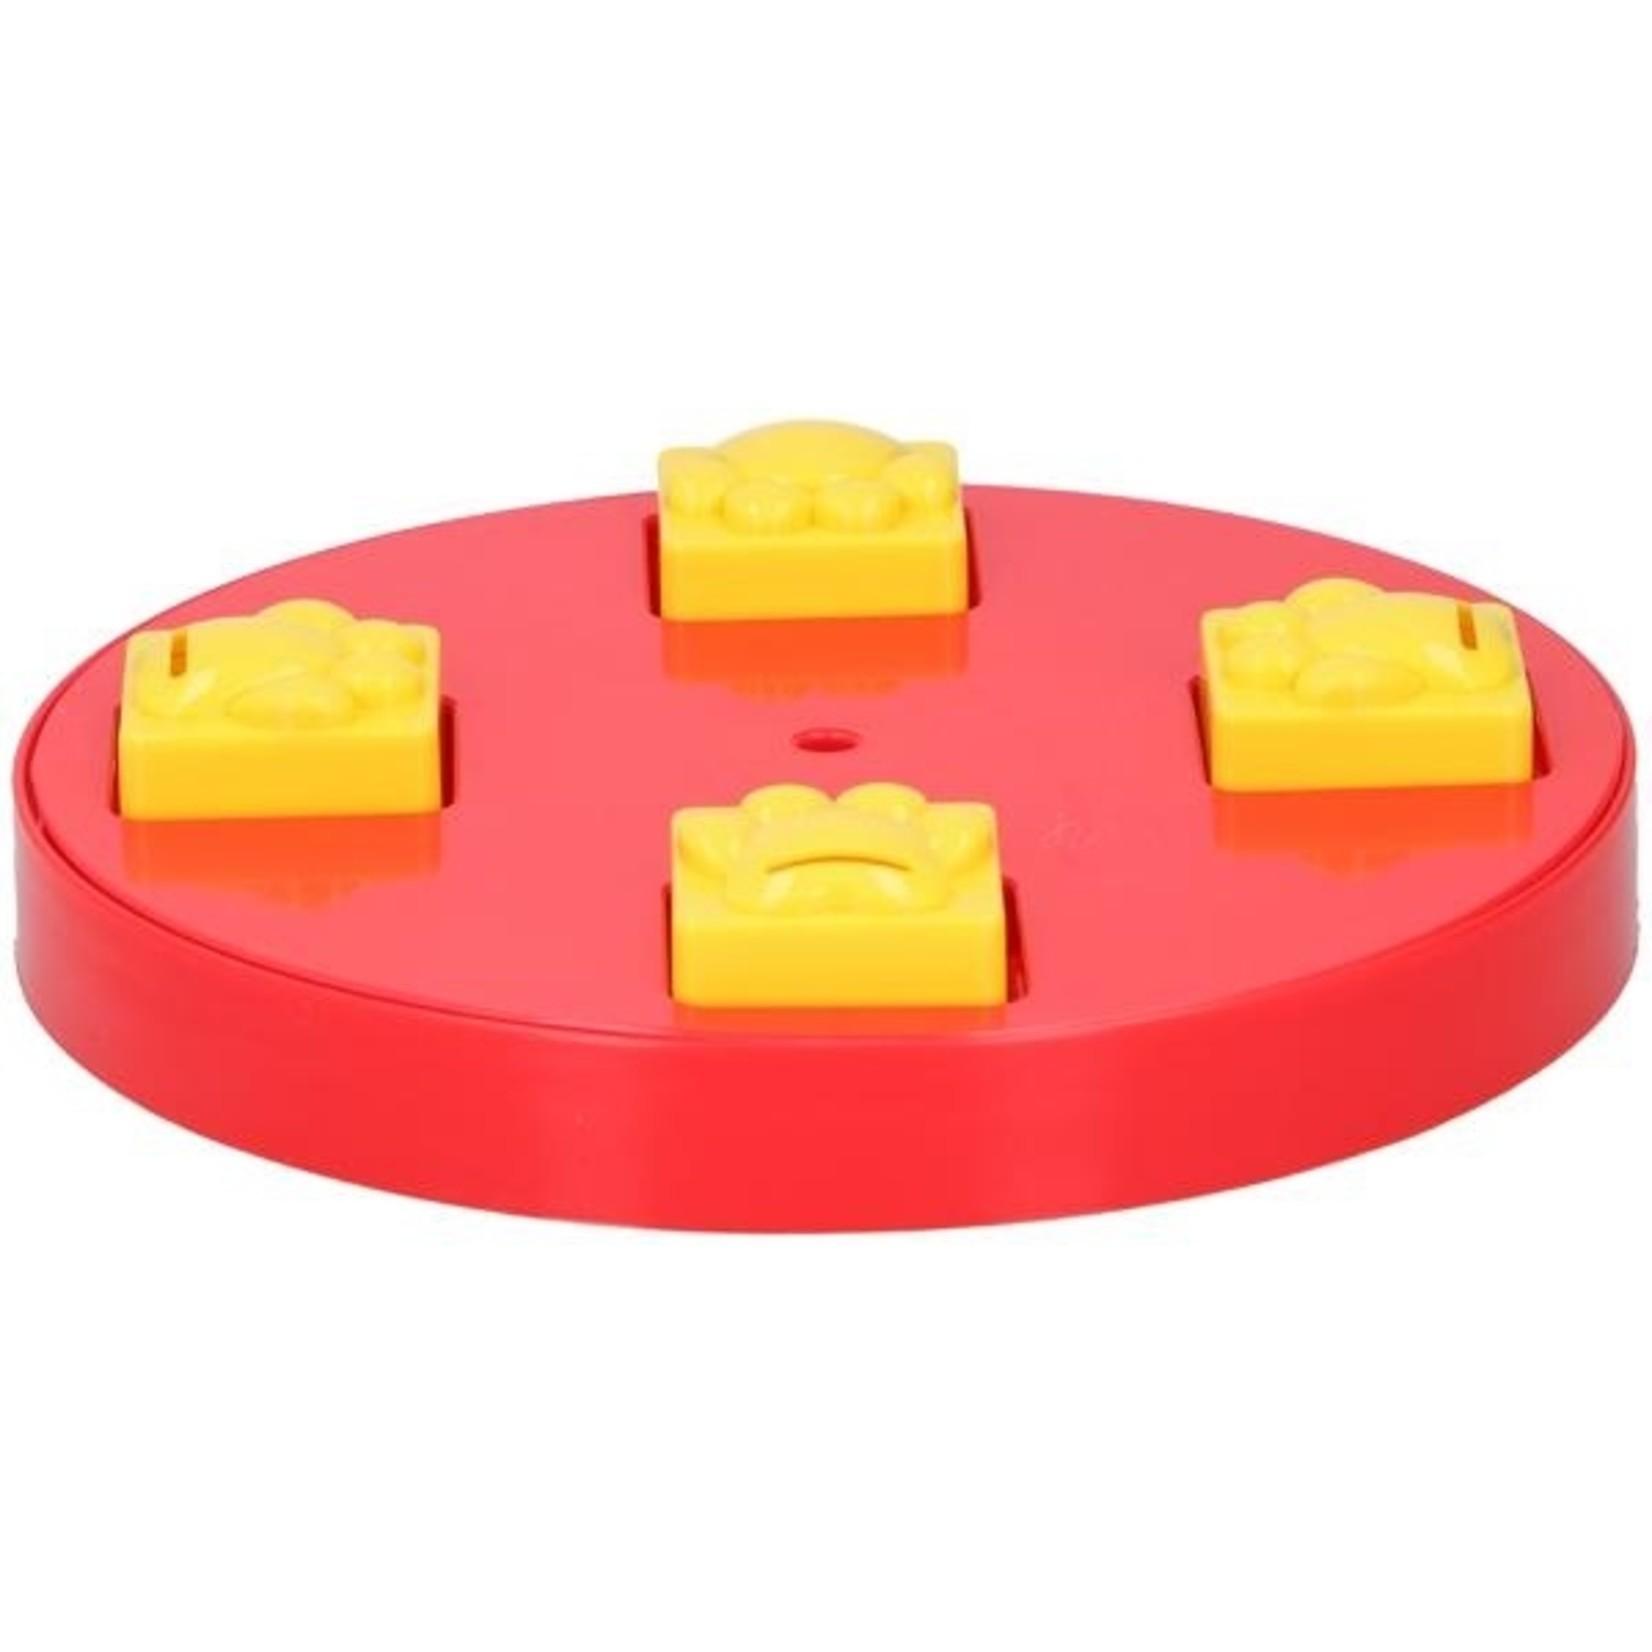 Intelligentiespel Yellow-Red